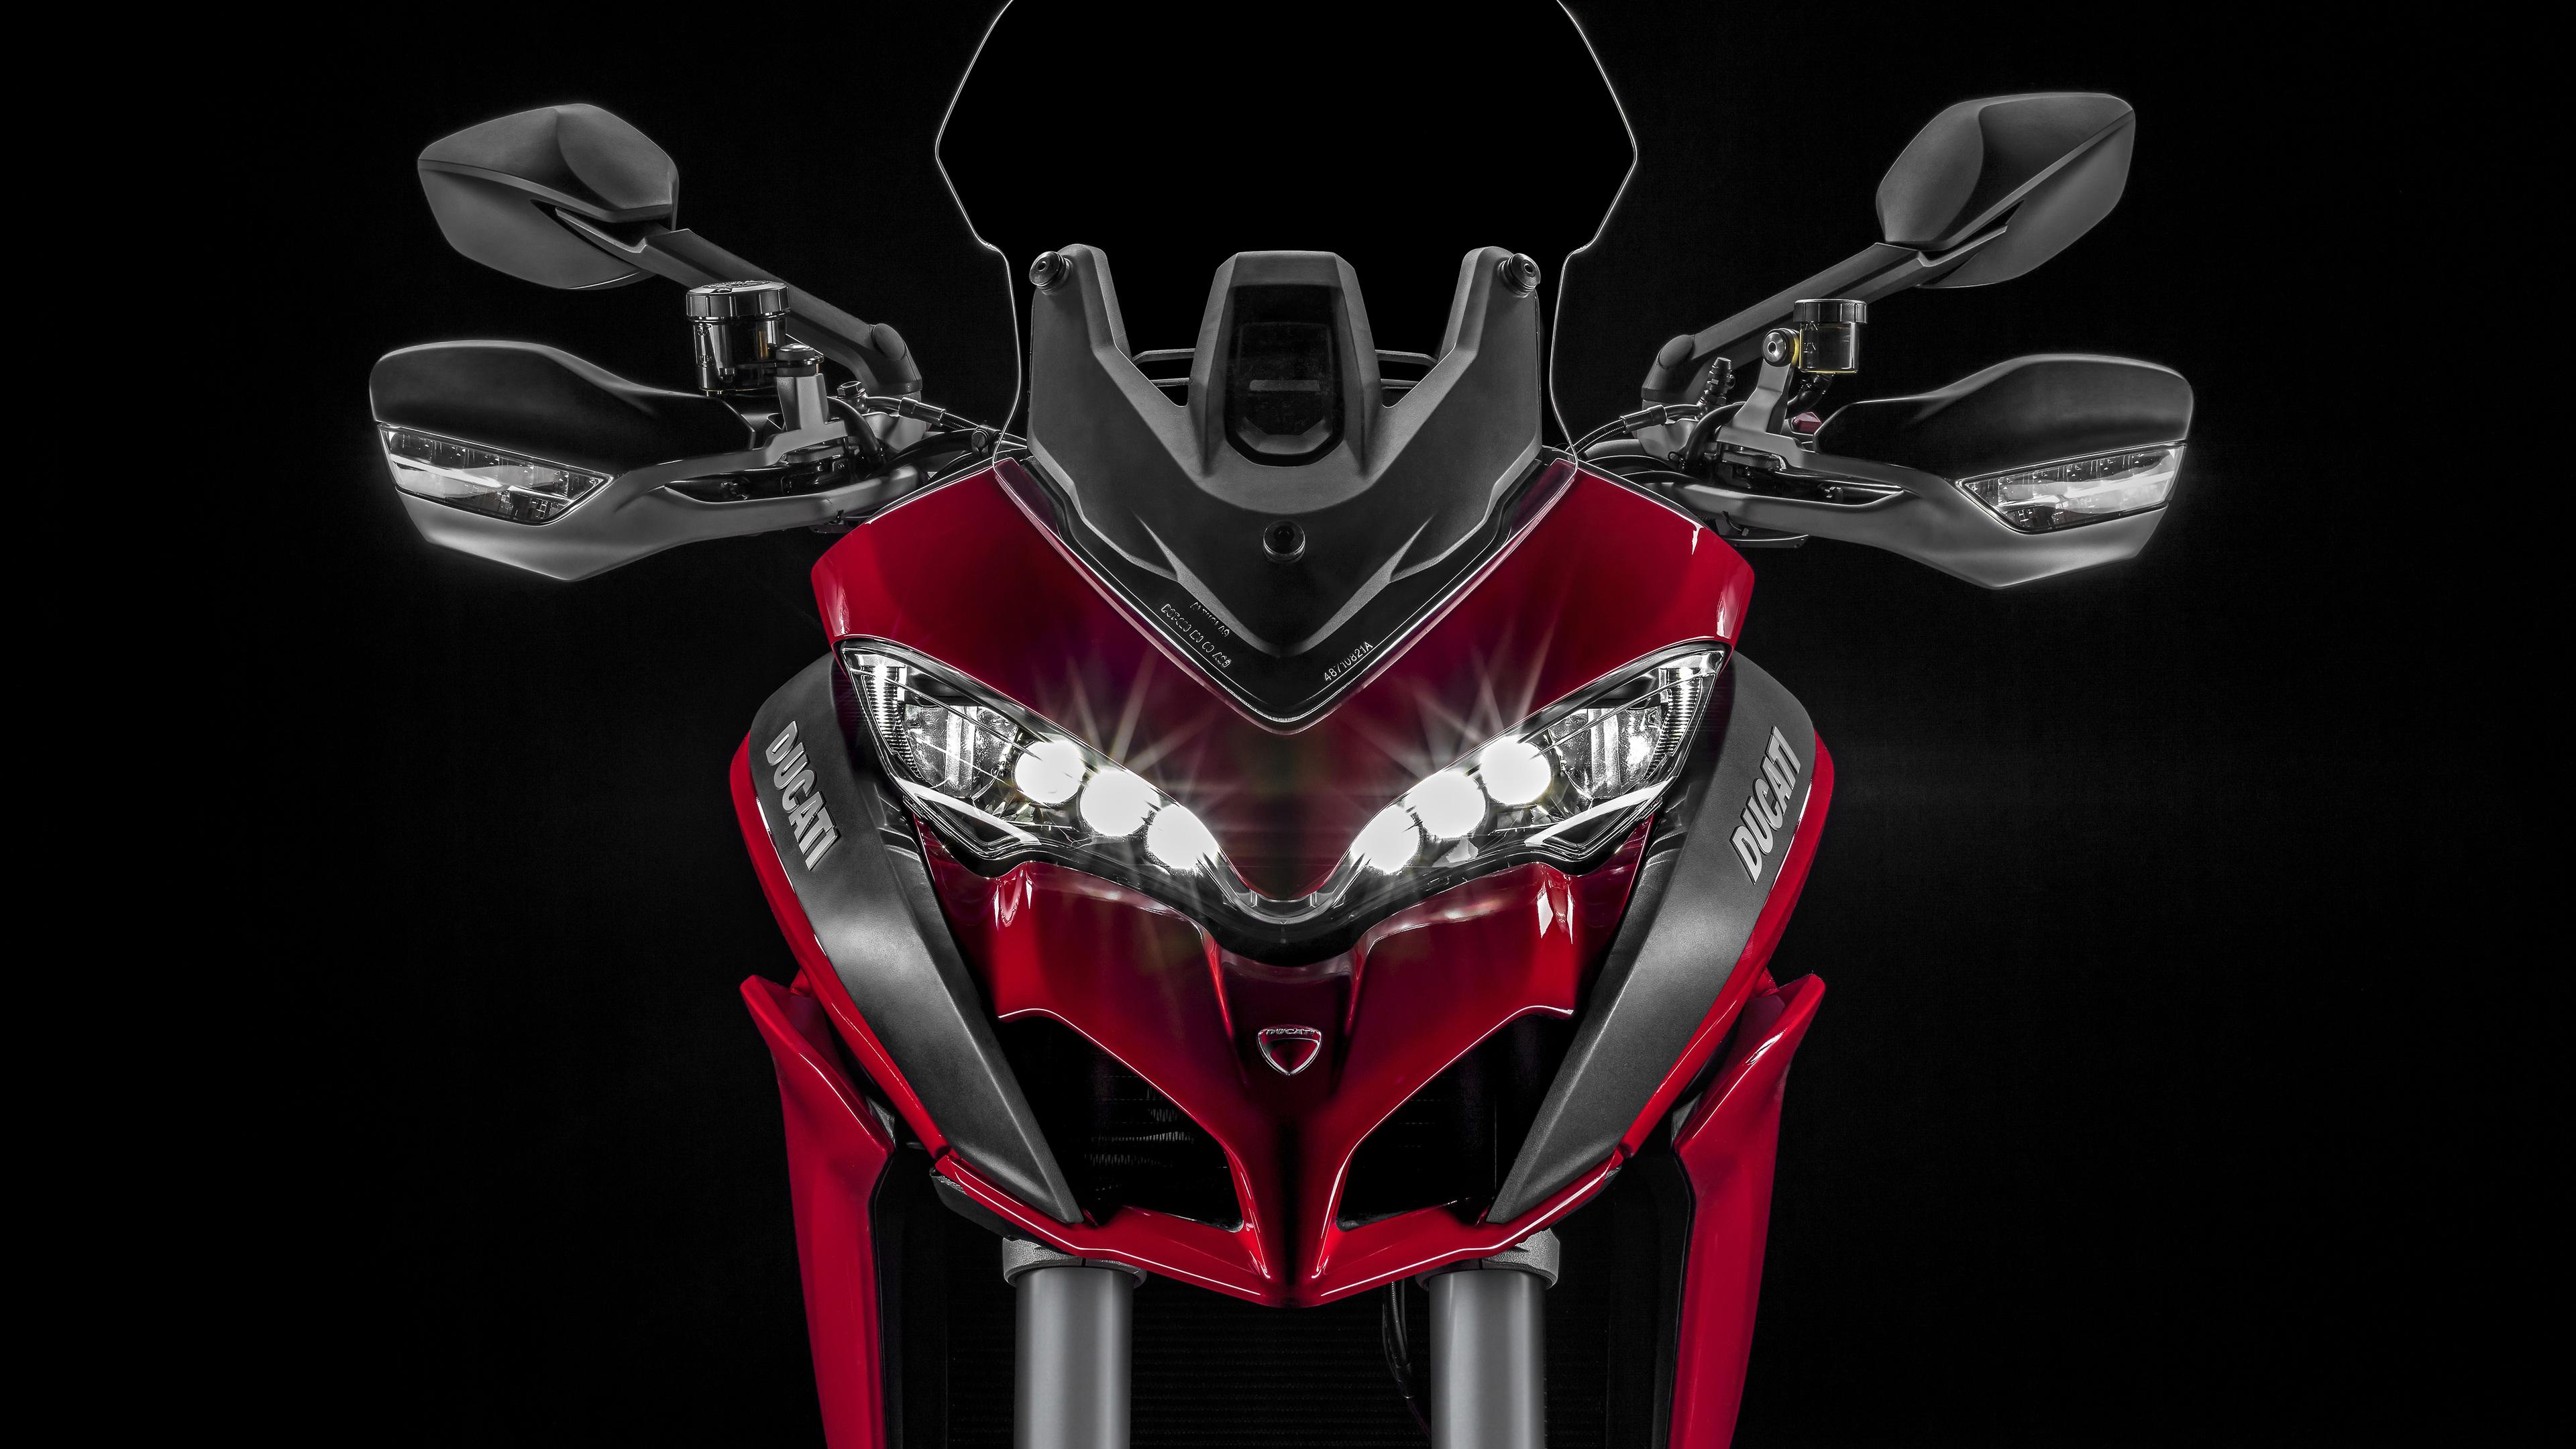 ducati multistrada 1200s 4k 1536316204 - Ducati Multistrada 1200S 4k - red wallpapers, ducati wallpapers, bikes wallpapers